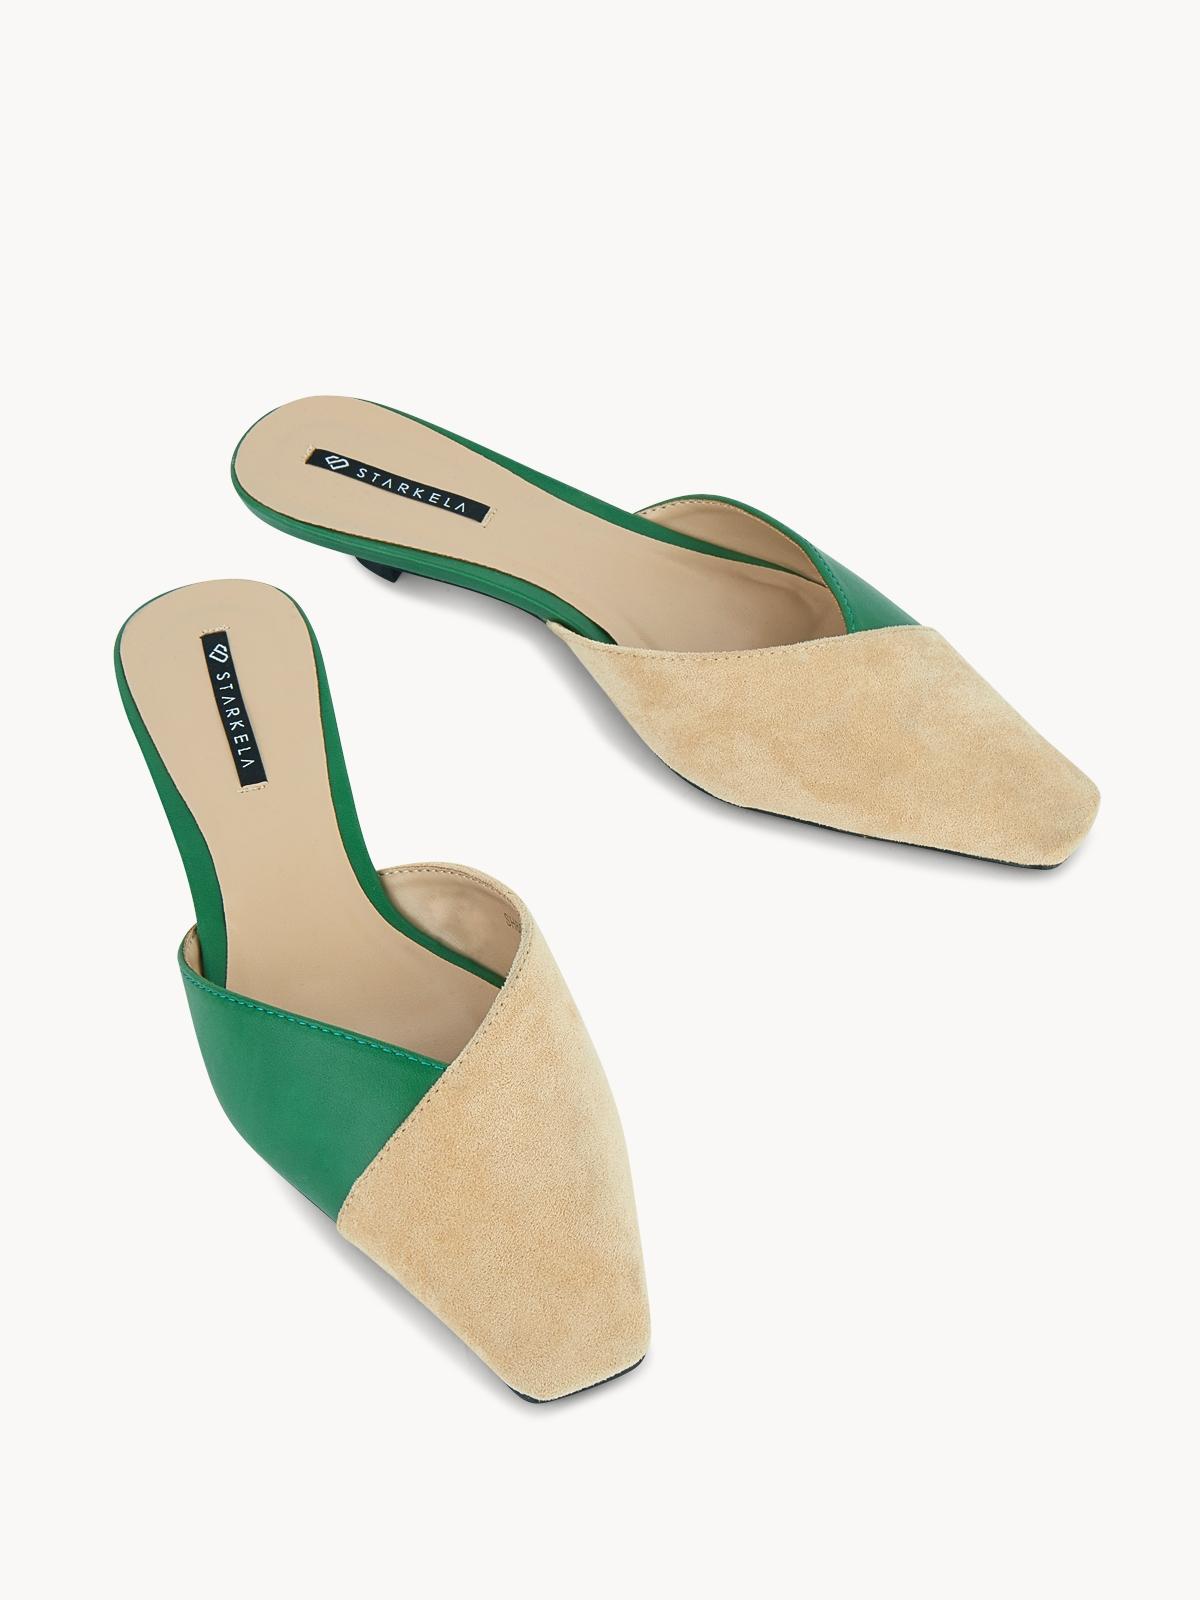 Starkela Two Tone Mid Heel Mules Green